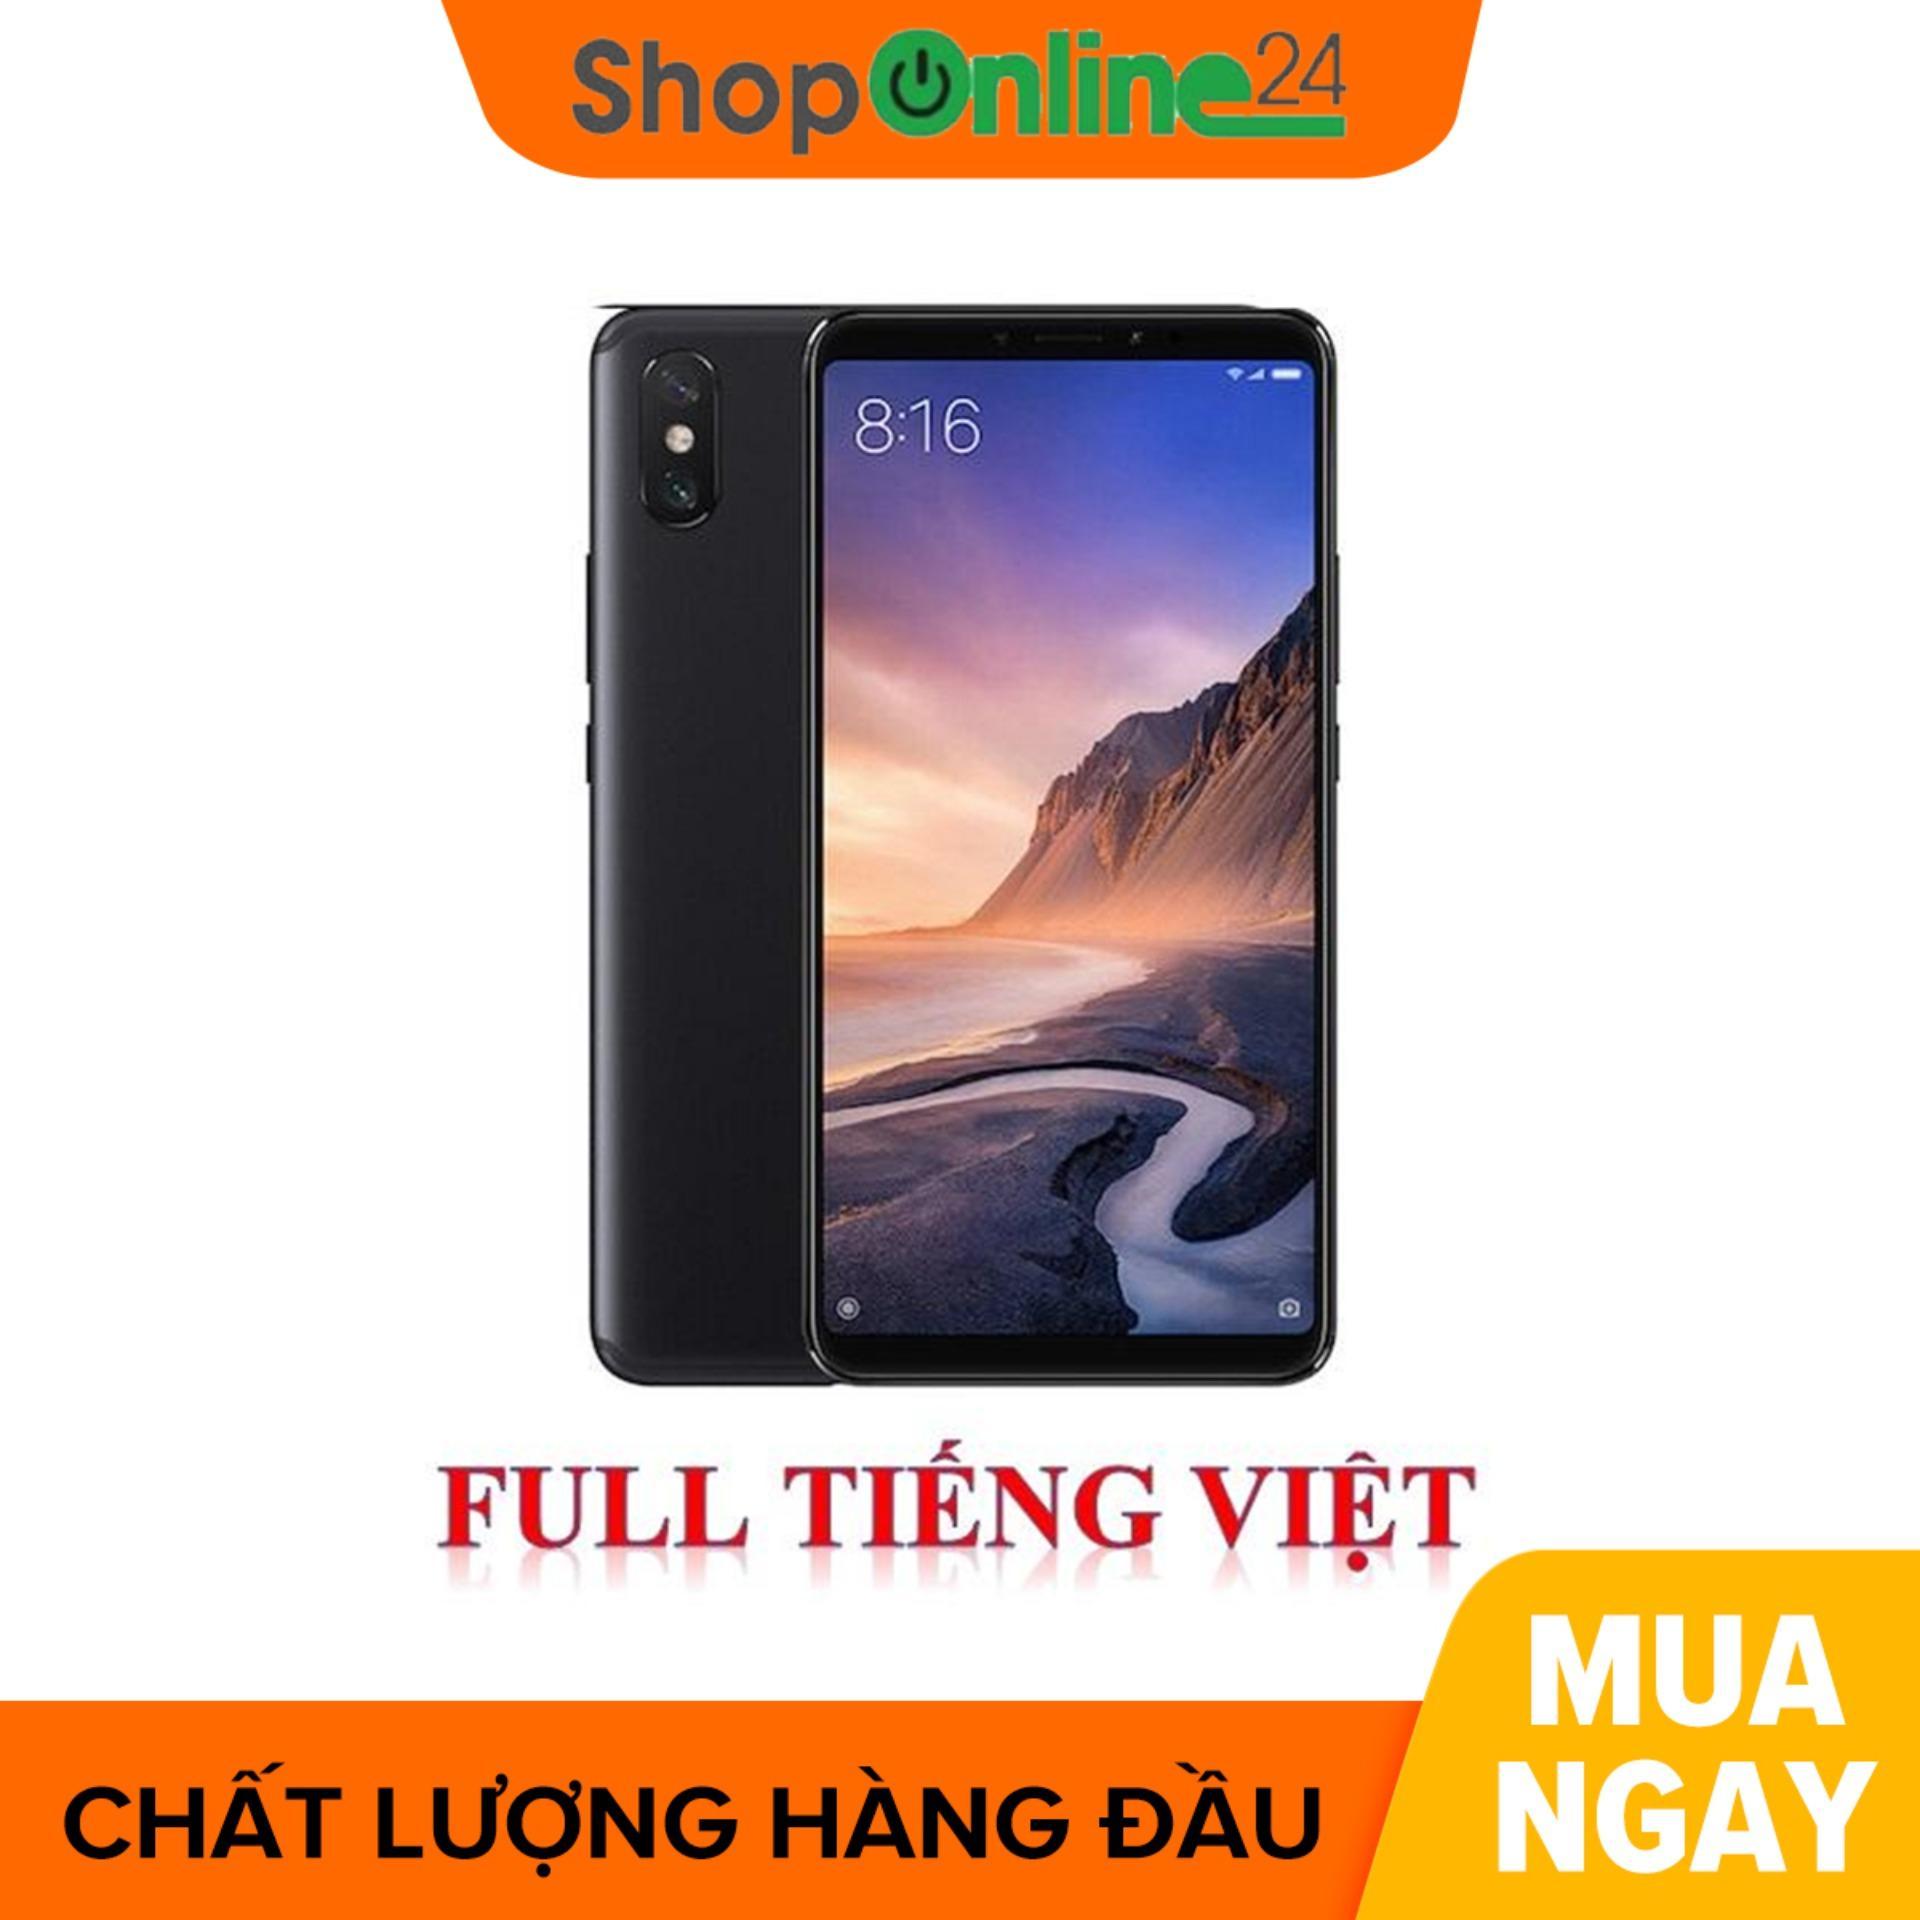 Lazada Khuyến Mãi Khi Mua Xiaomi Mi Max 3 64GB Ram 4GB ( Đen ) Full Tiếng Việt - Shop Online 24 - Hàng Nhập Khẩu